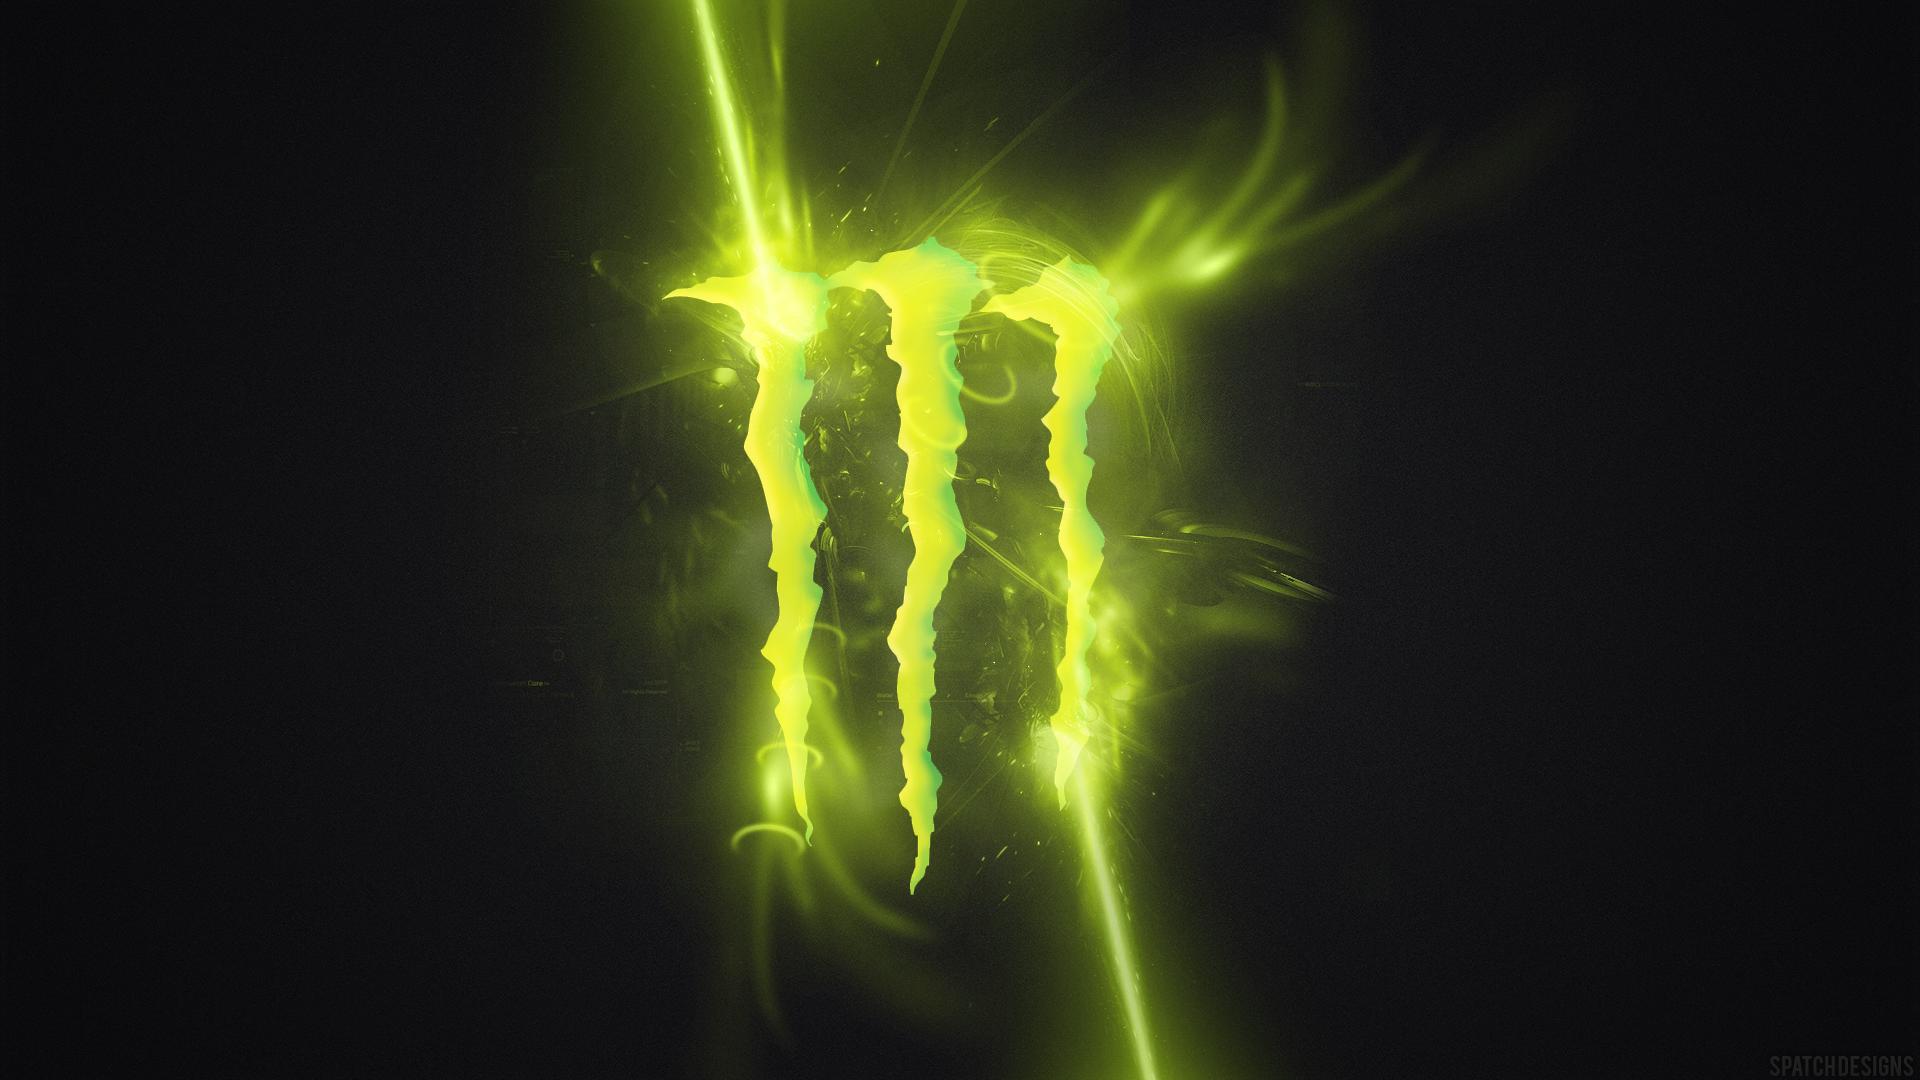 Beautiful Monster Energy Logo Hd Wallpaper Picture Sharing Monster Pictures Energy Logo Monster Energy